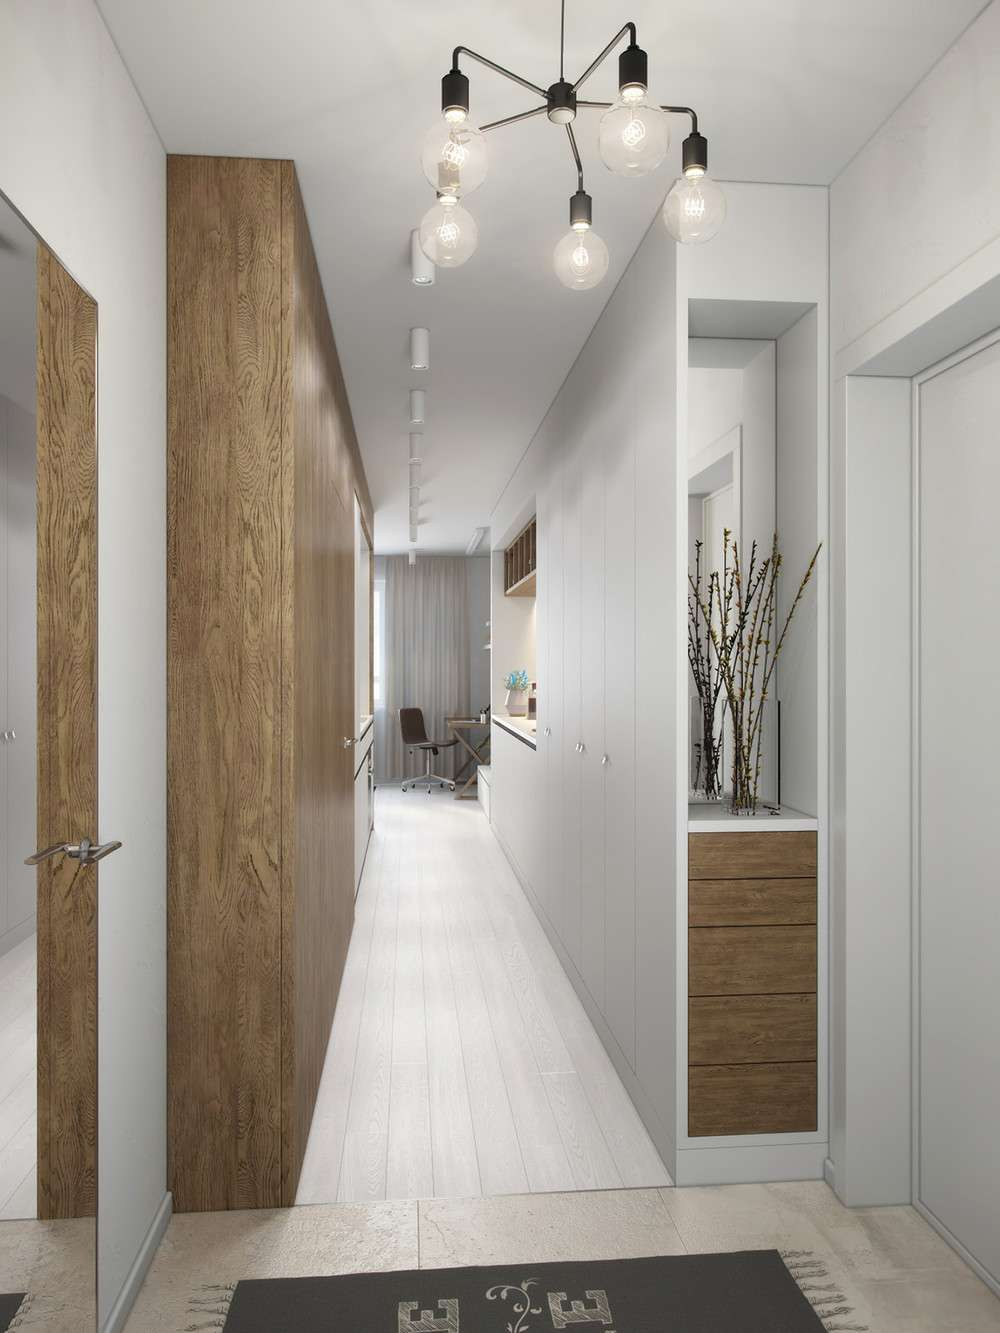 Decoracion de apartamentos peque os dise os de moda for Decoracion de deptos pequenos fotos